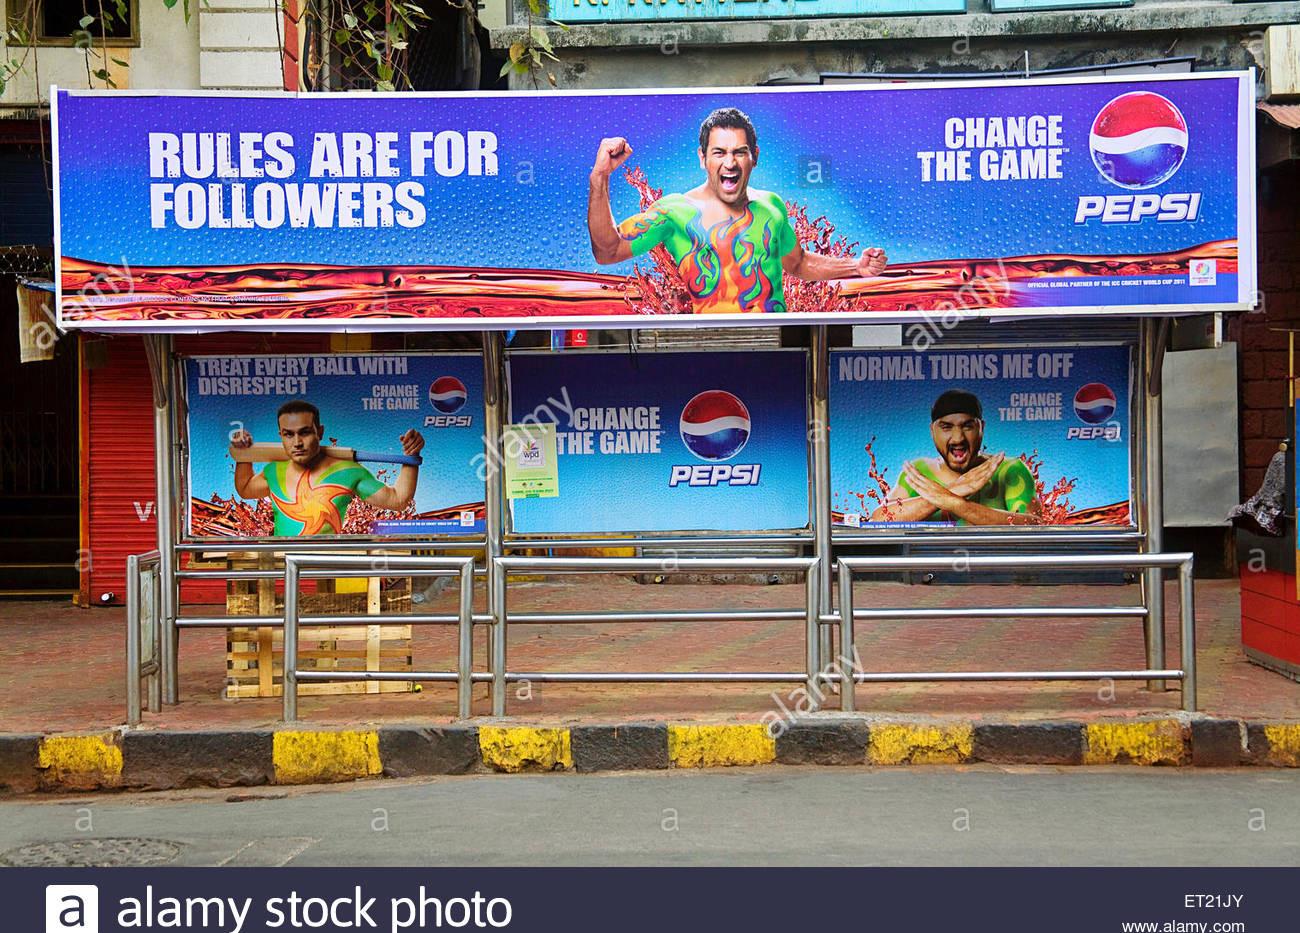 pepsi-advertising-hoarding-on-bus-stop-m